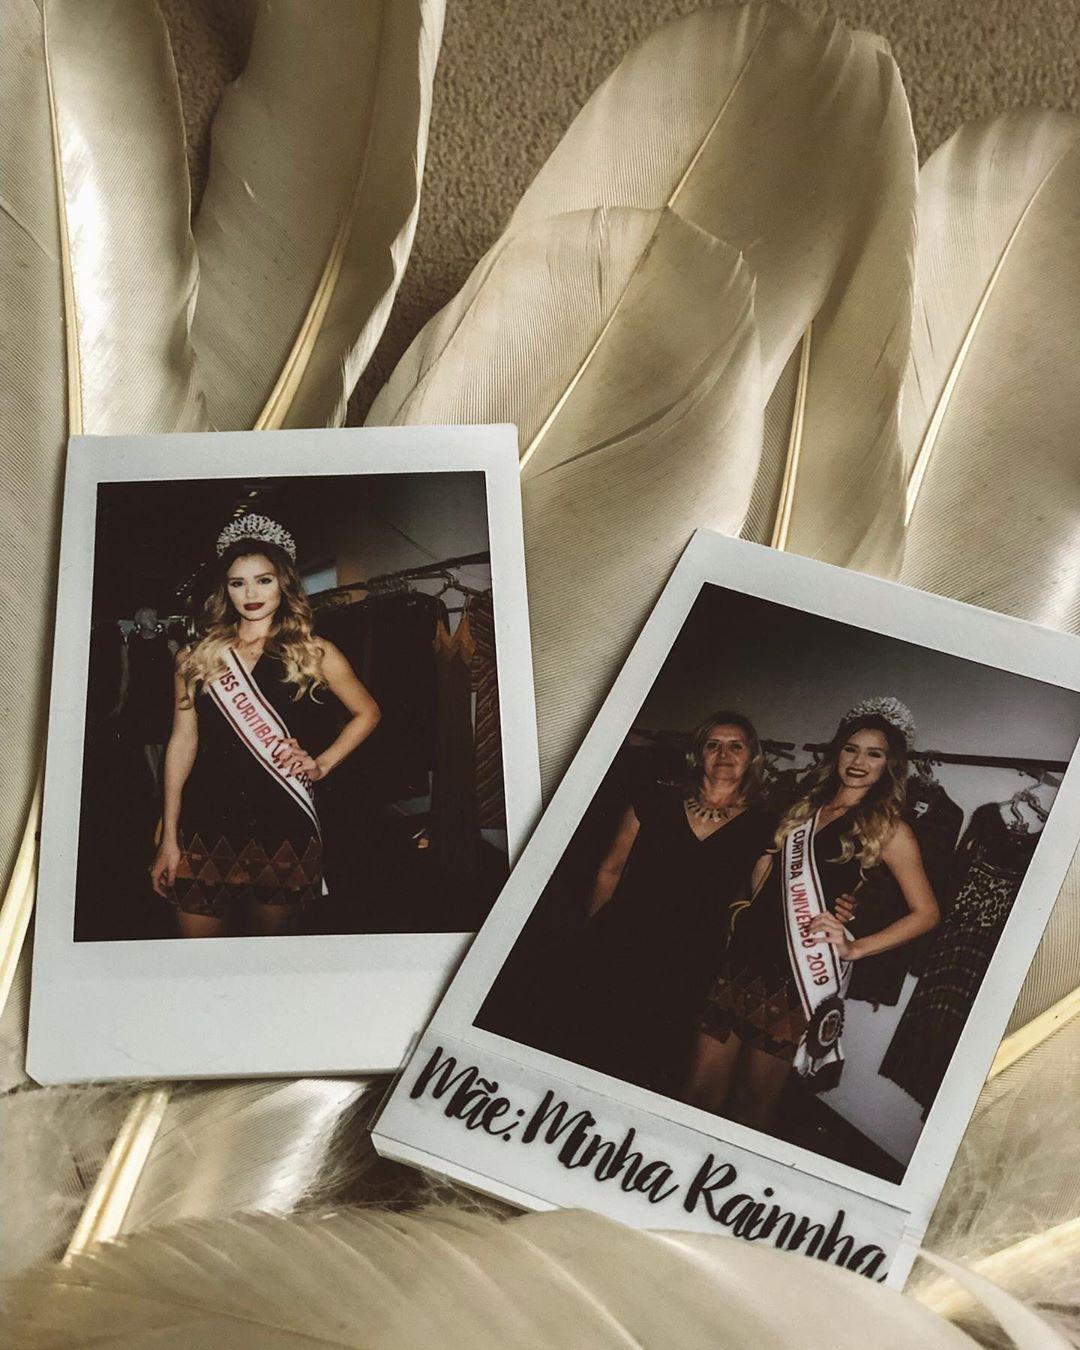 marcella kozinski de barros, miss curitiba 2020/3rd runner-up de miss tourism world 2019. - Página 2 58410810